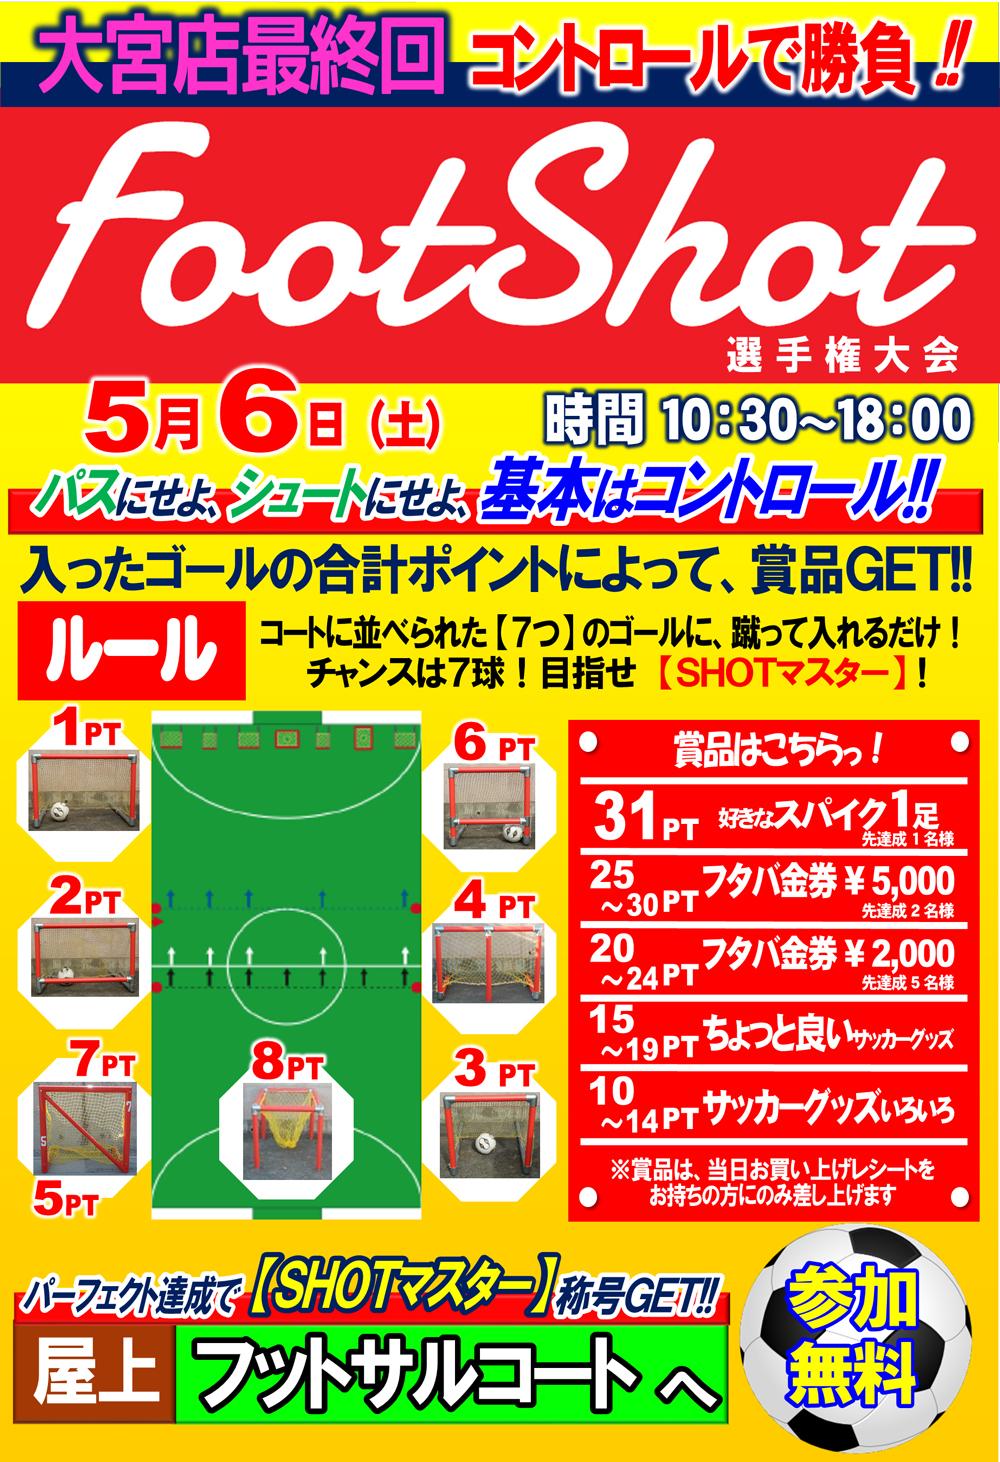 LAST_FOOTSHOT